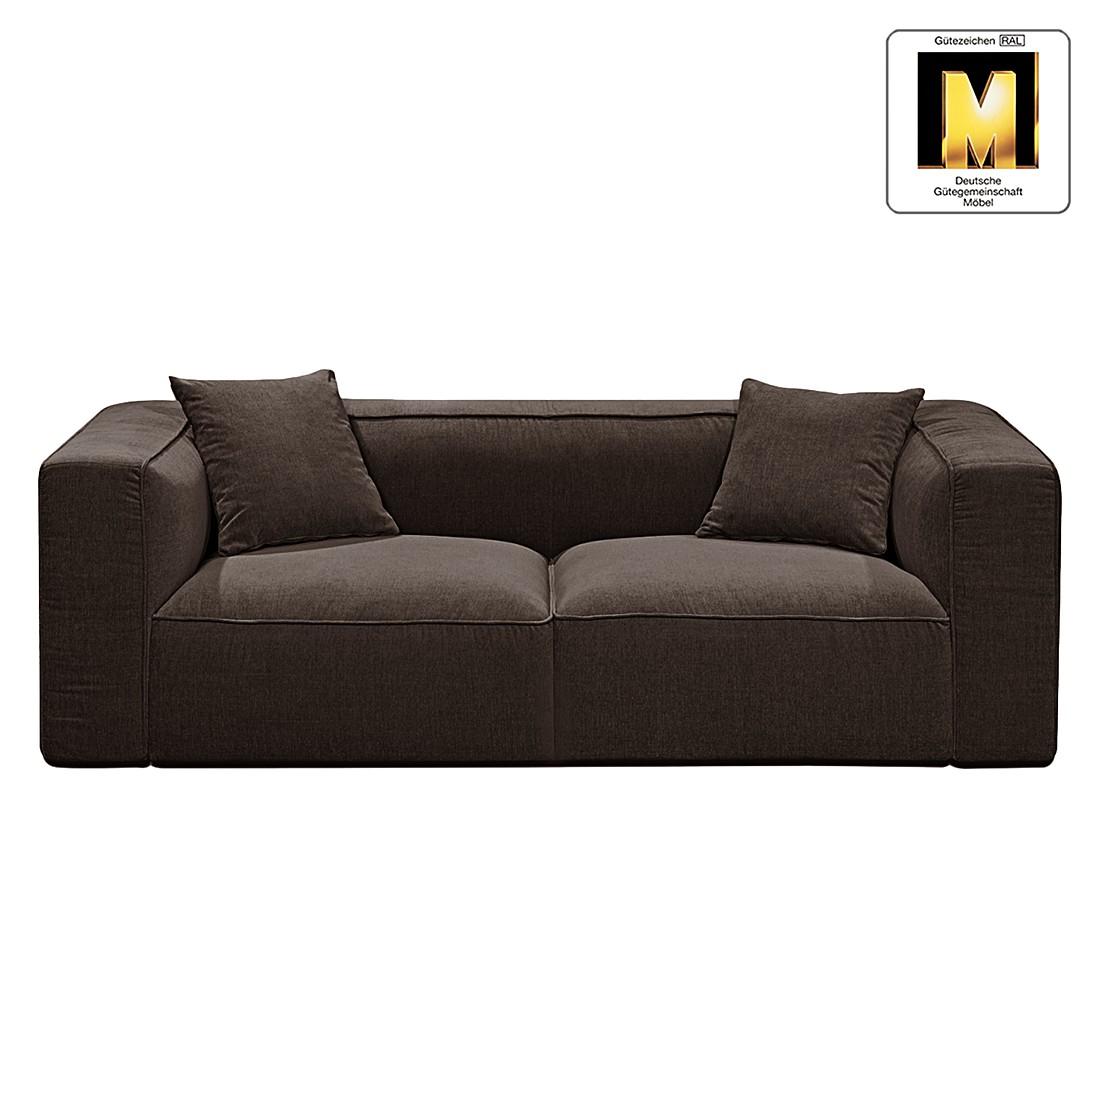 Sofa Casual Line VIII (2-Sitzer) – Velours Dunkelbraun, Claas Claasen online kaufen